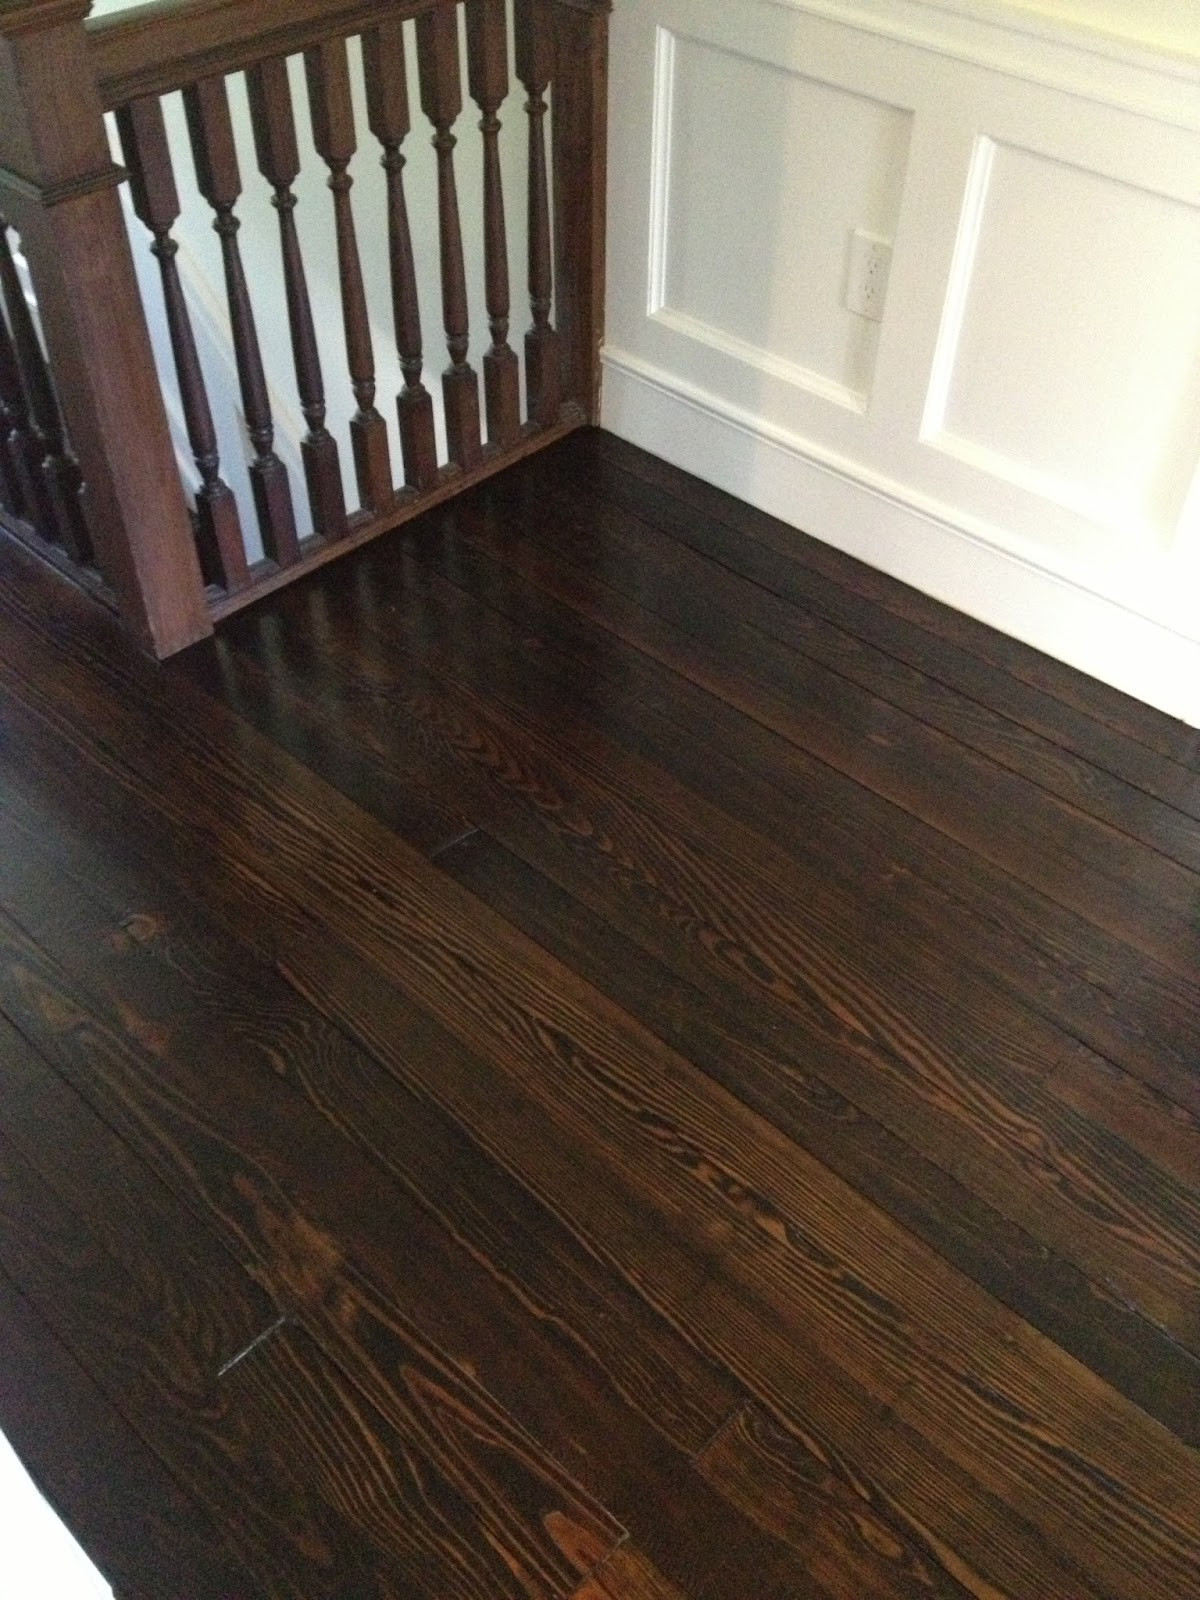 hardwood floor trim around fireplace of wood floor jacobean wood floor stain within images of jacobean wood floor stain